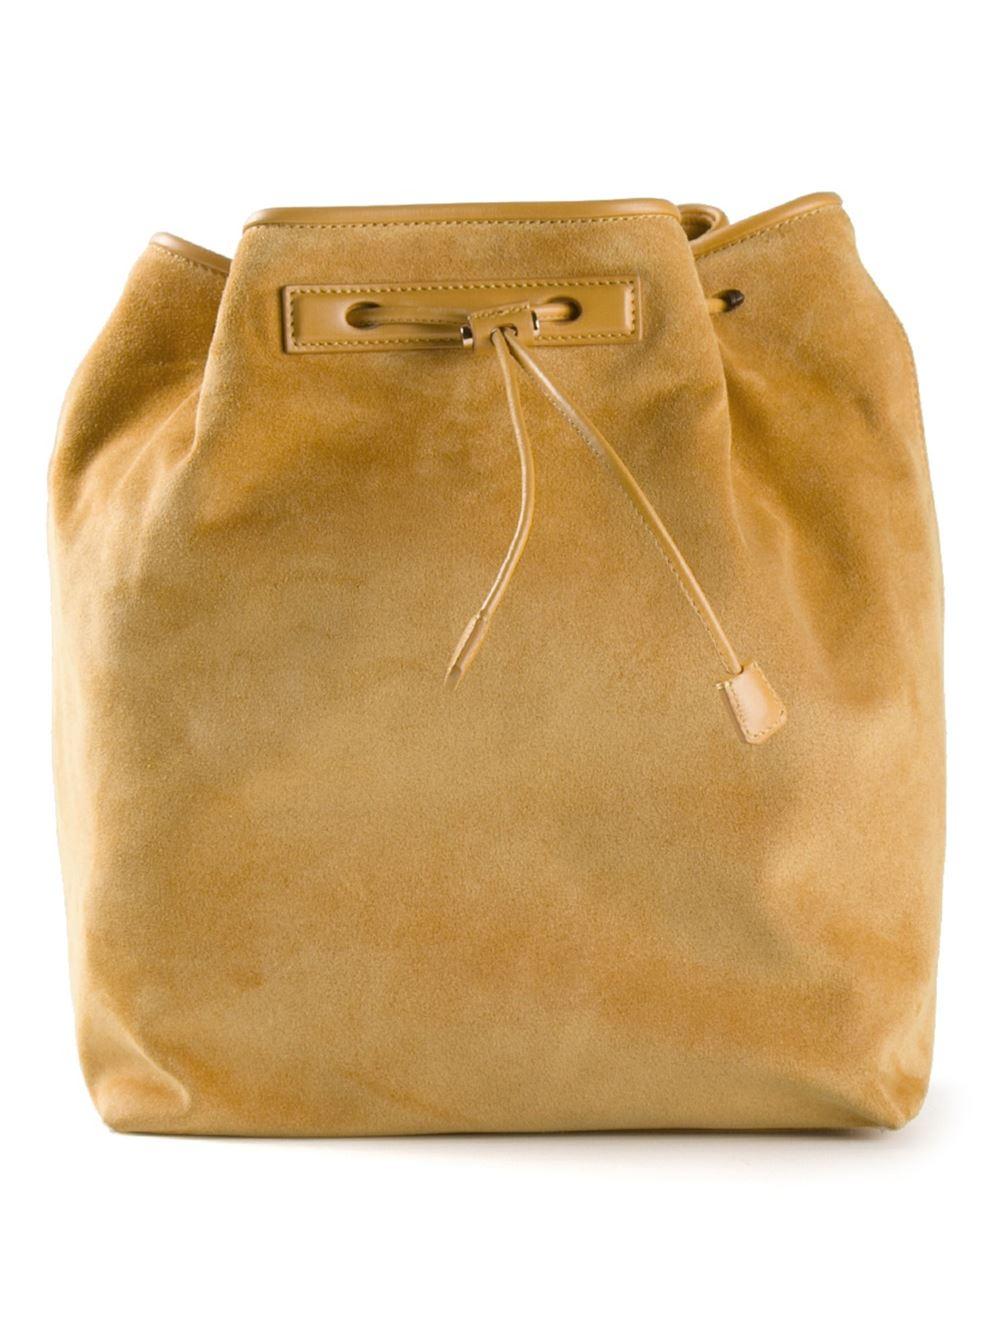 The Row Backpack 9 Bag in Yellow & Orange (Orange)